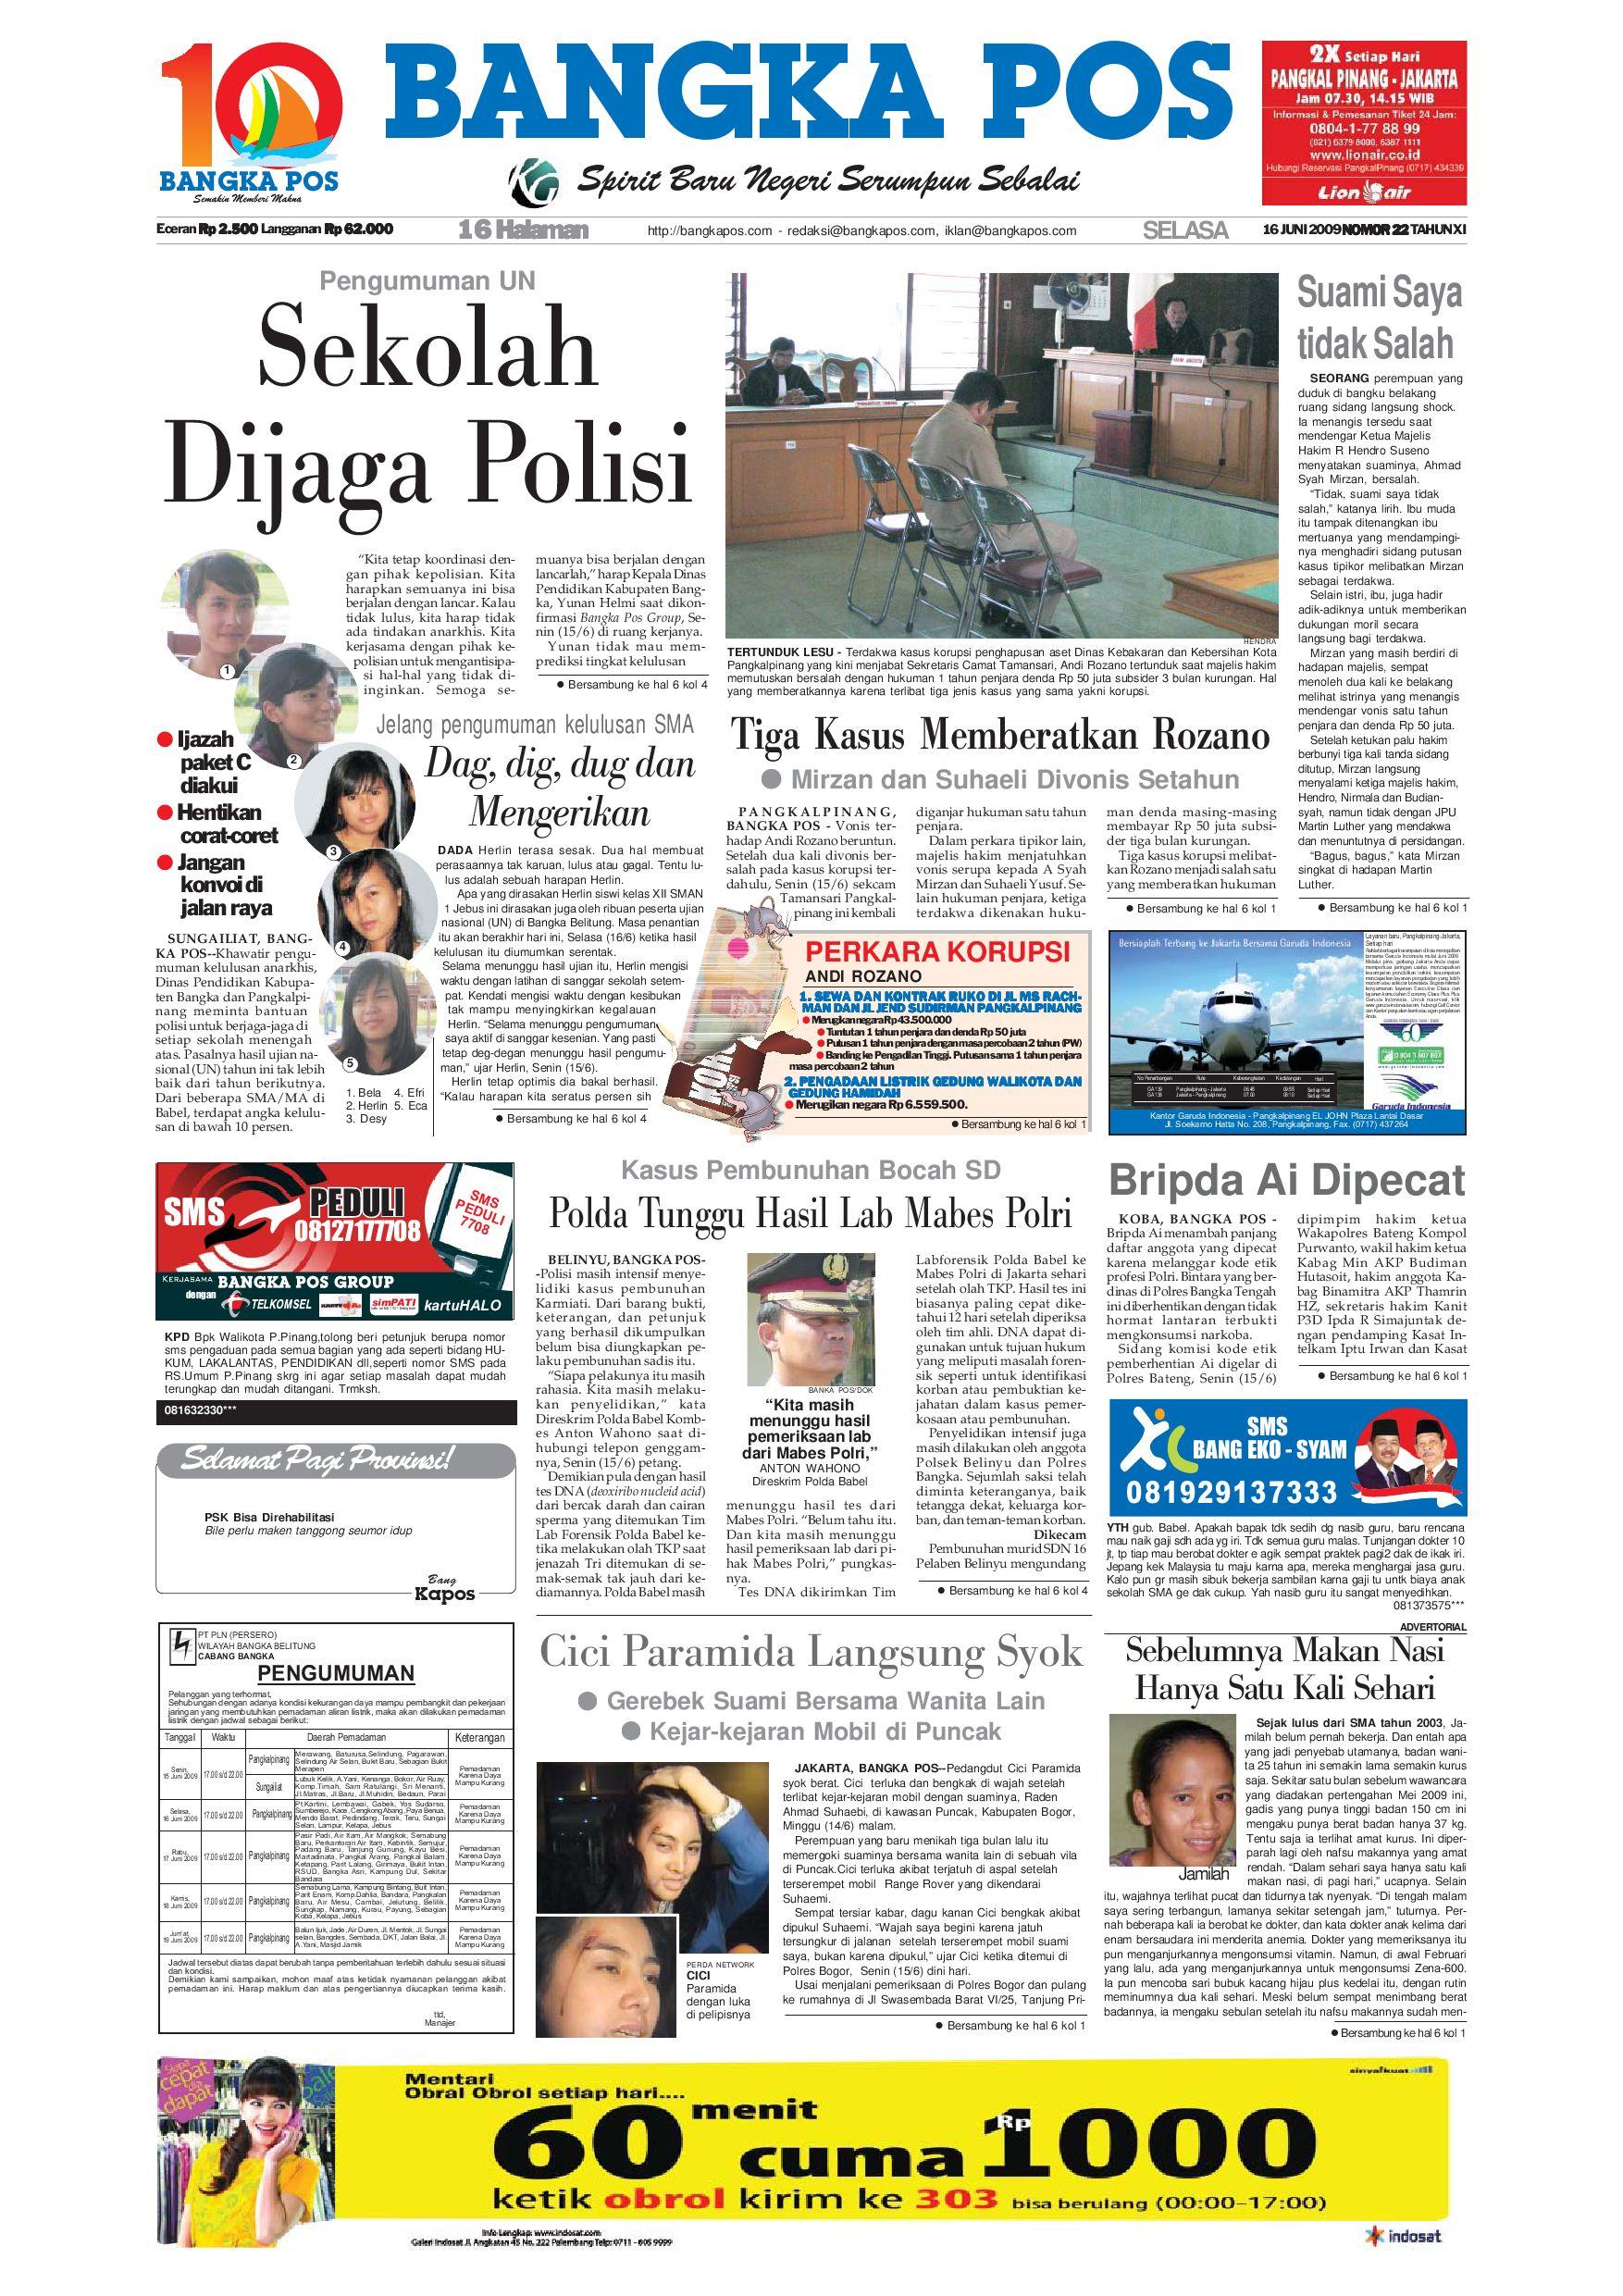 Harian Pagi Bangka Pos Edisi 16 Juni 2009 By Issuu Cut Off Machine Hitachi Cc 16sb Include Ppn